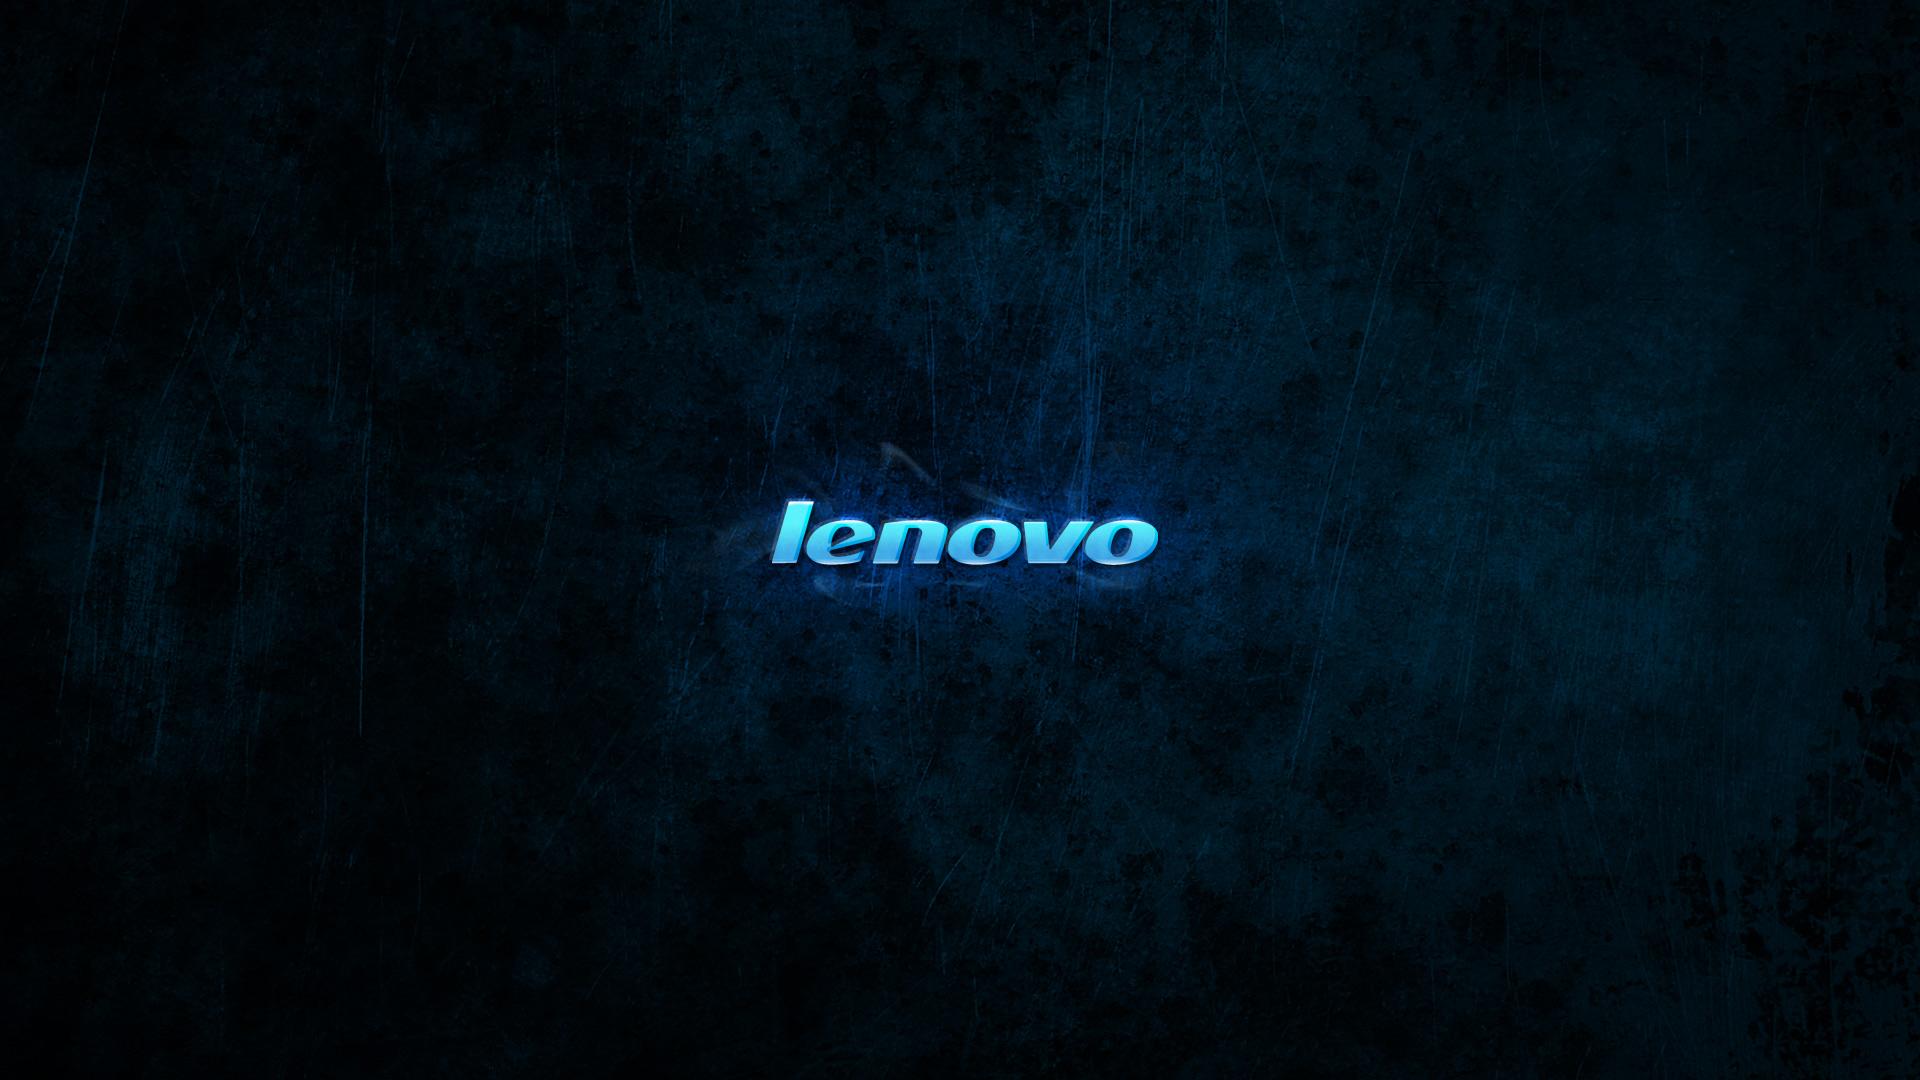 Lenovo Windows 10 Wallpaper